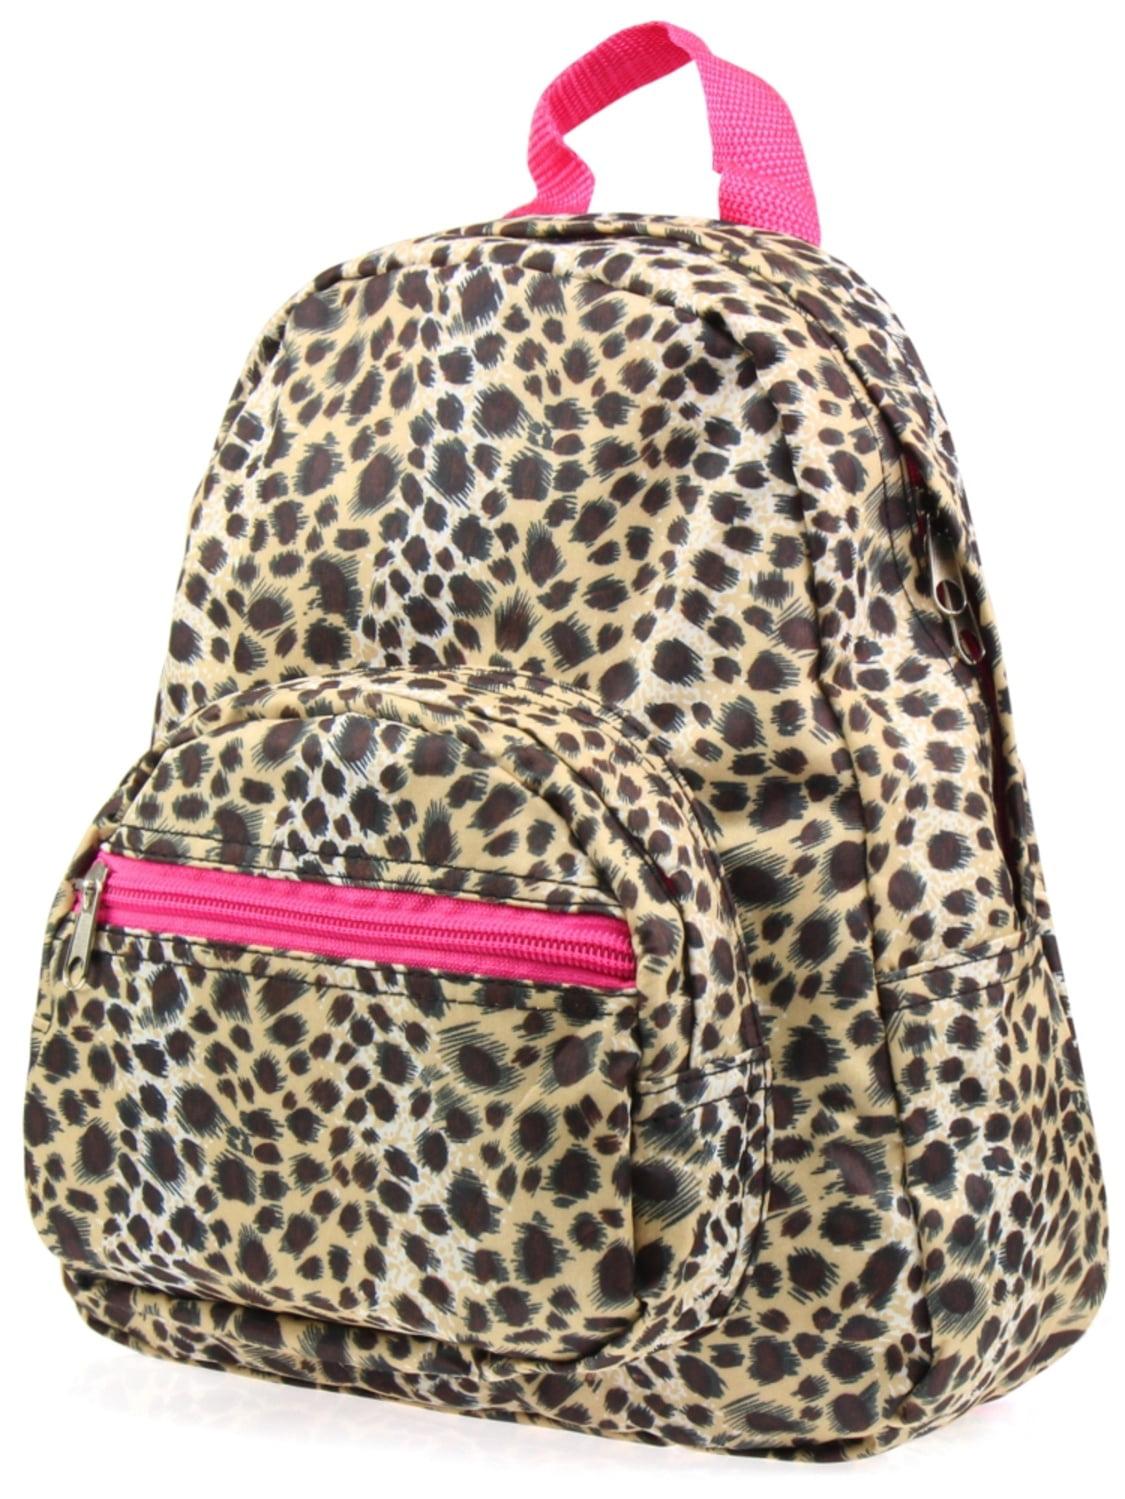 b44a7641a7fc Zodaca Stylish Kids Small Travel Backpack Girls Boys Schoolbag Children s  Bookbag Lunch Bag - Walmart.com